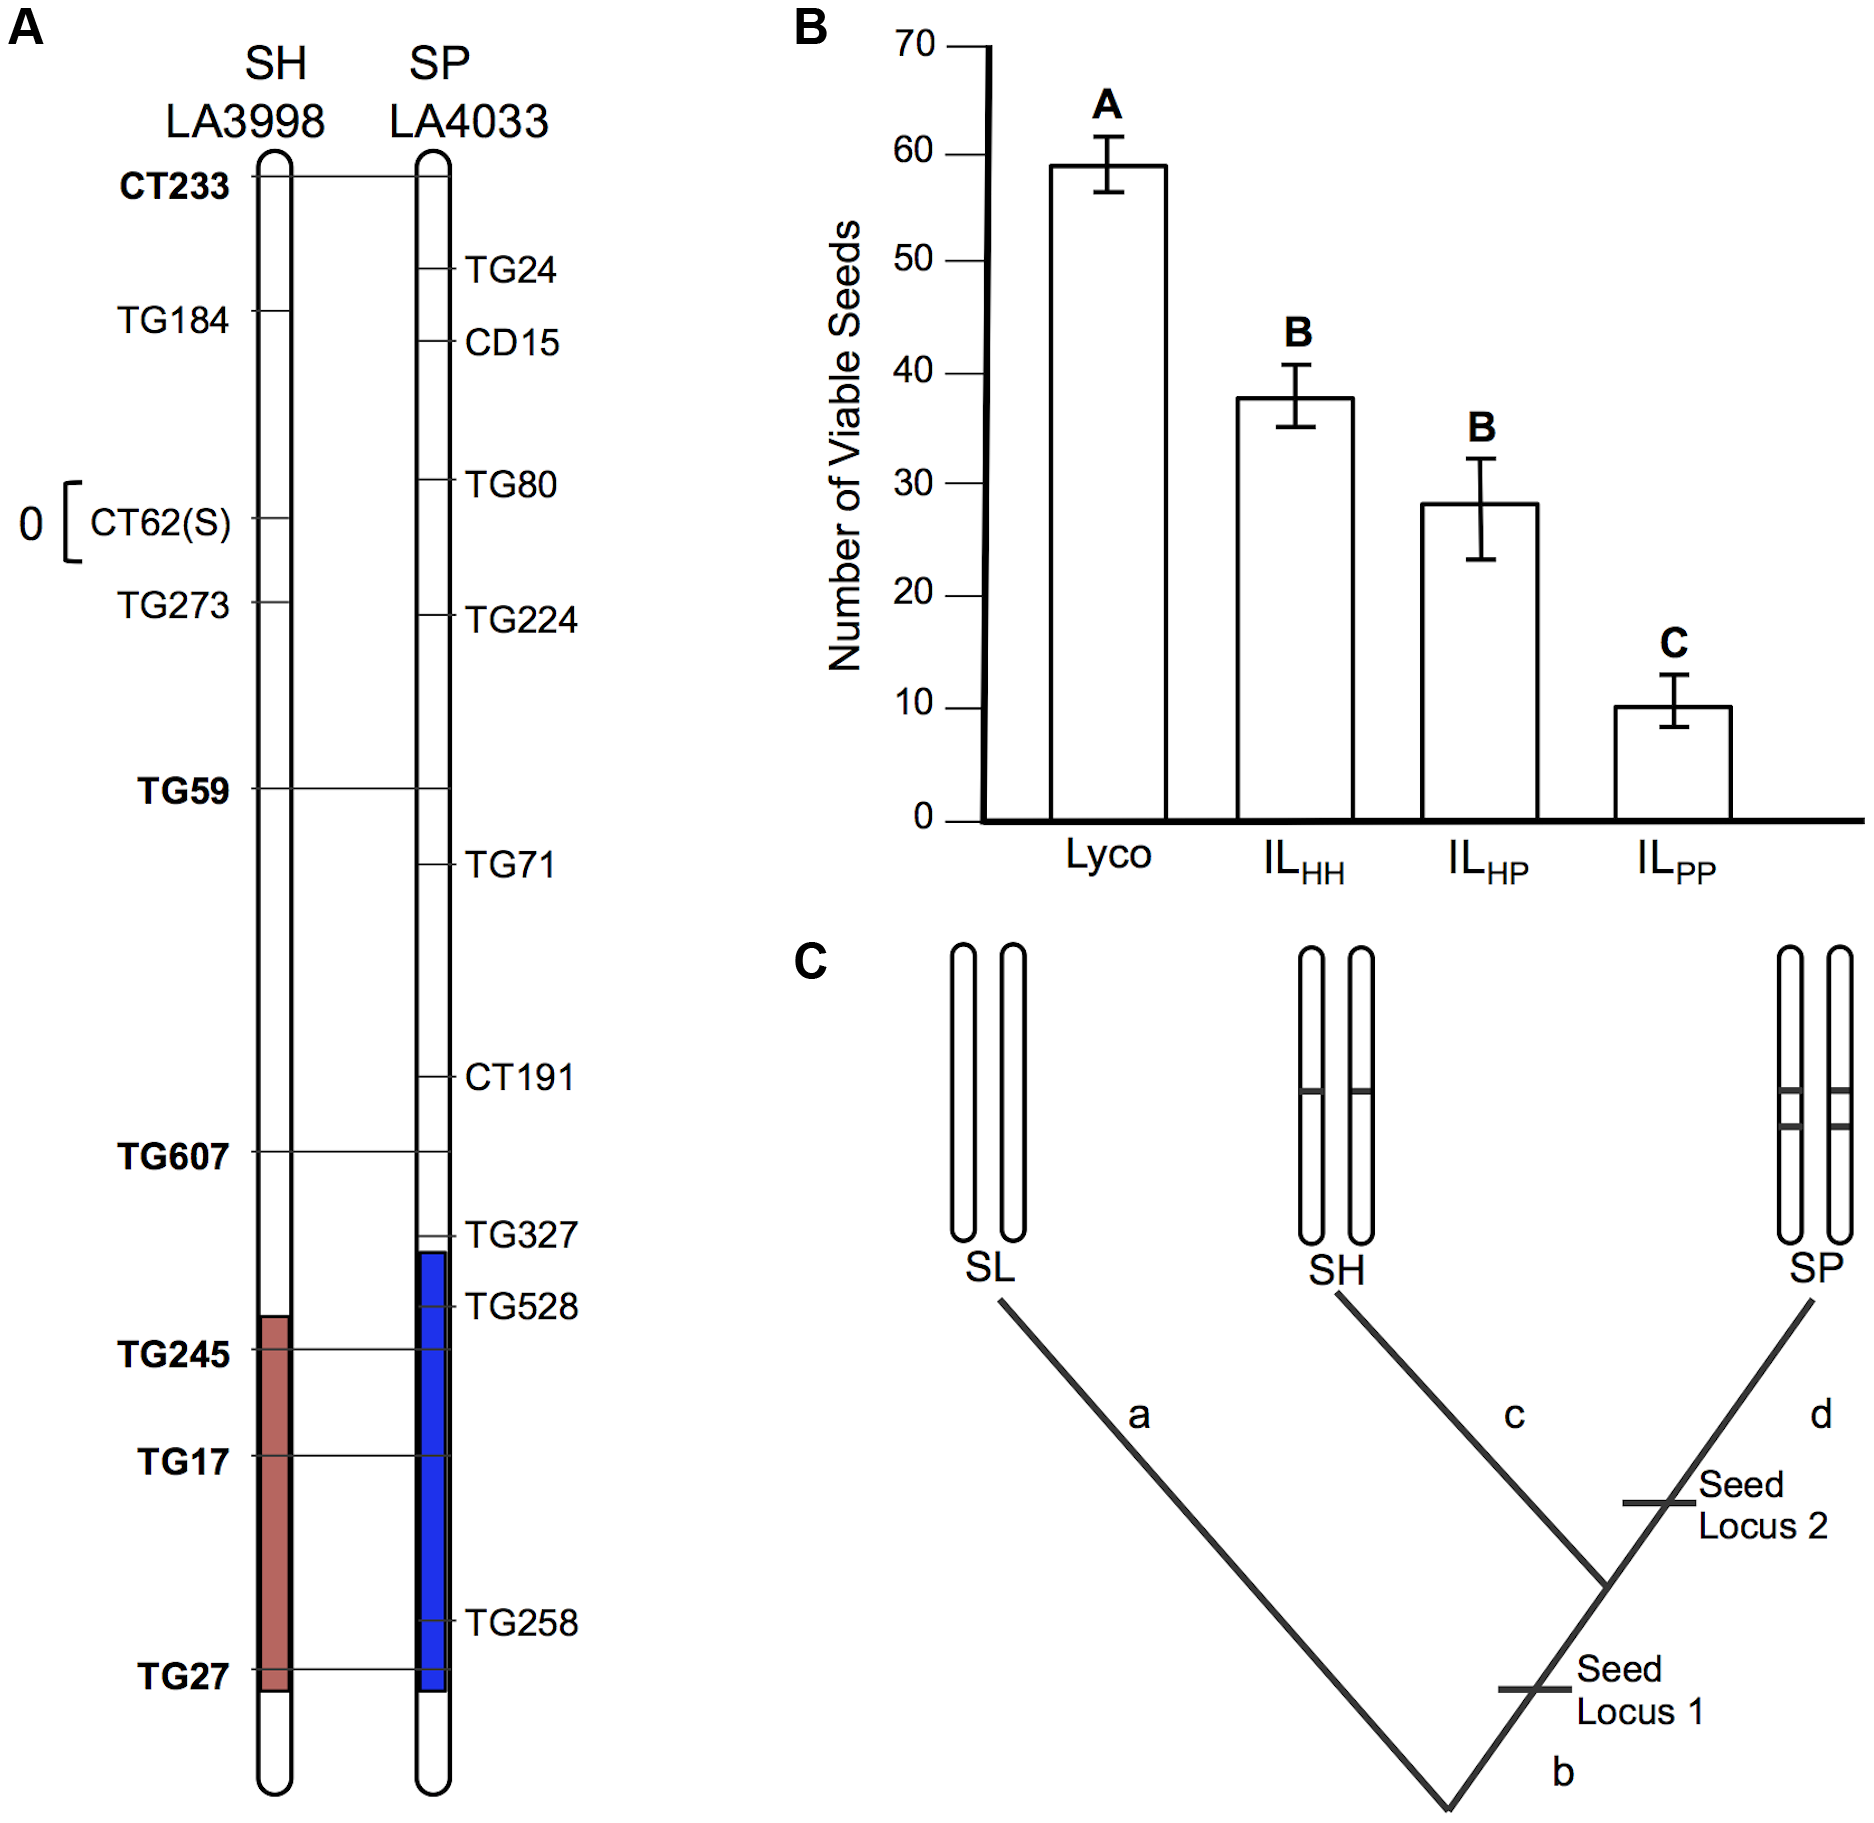 Test of allelism at seed sterility locus <i>sss1.2</i>.